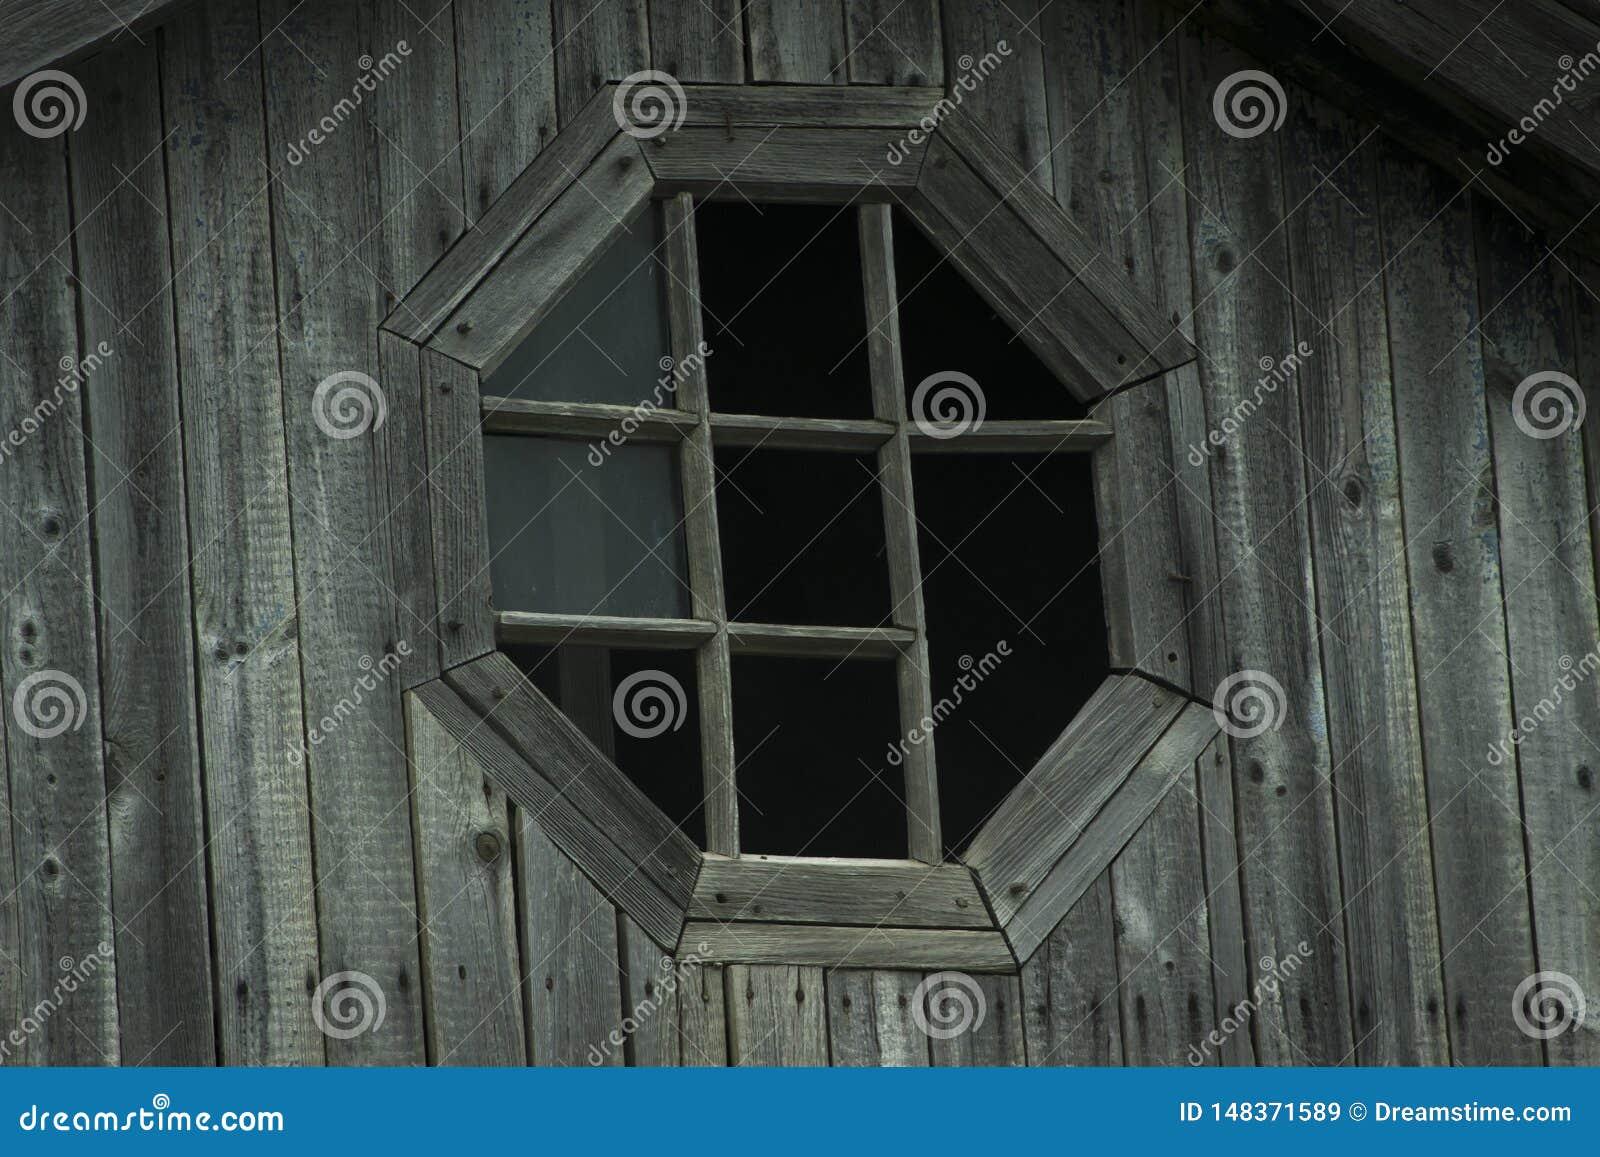 Old vintage wooden broken window